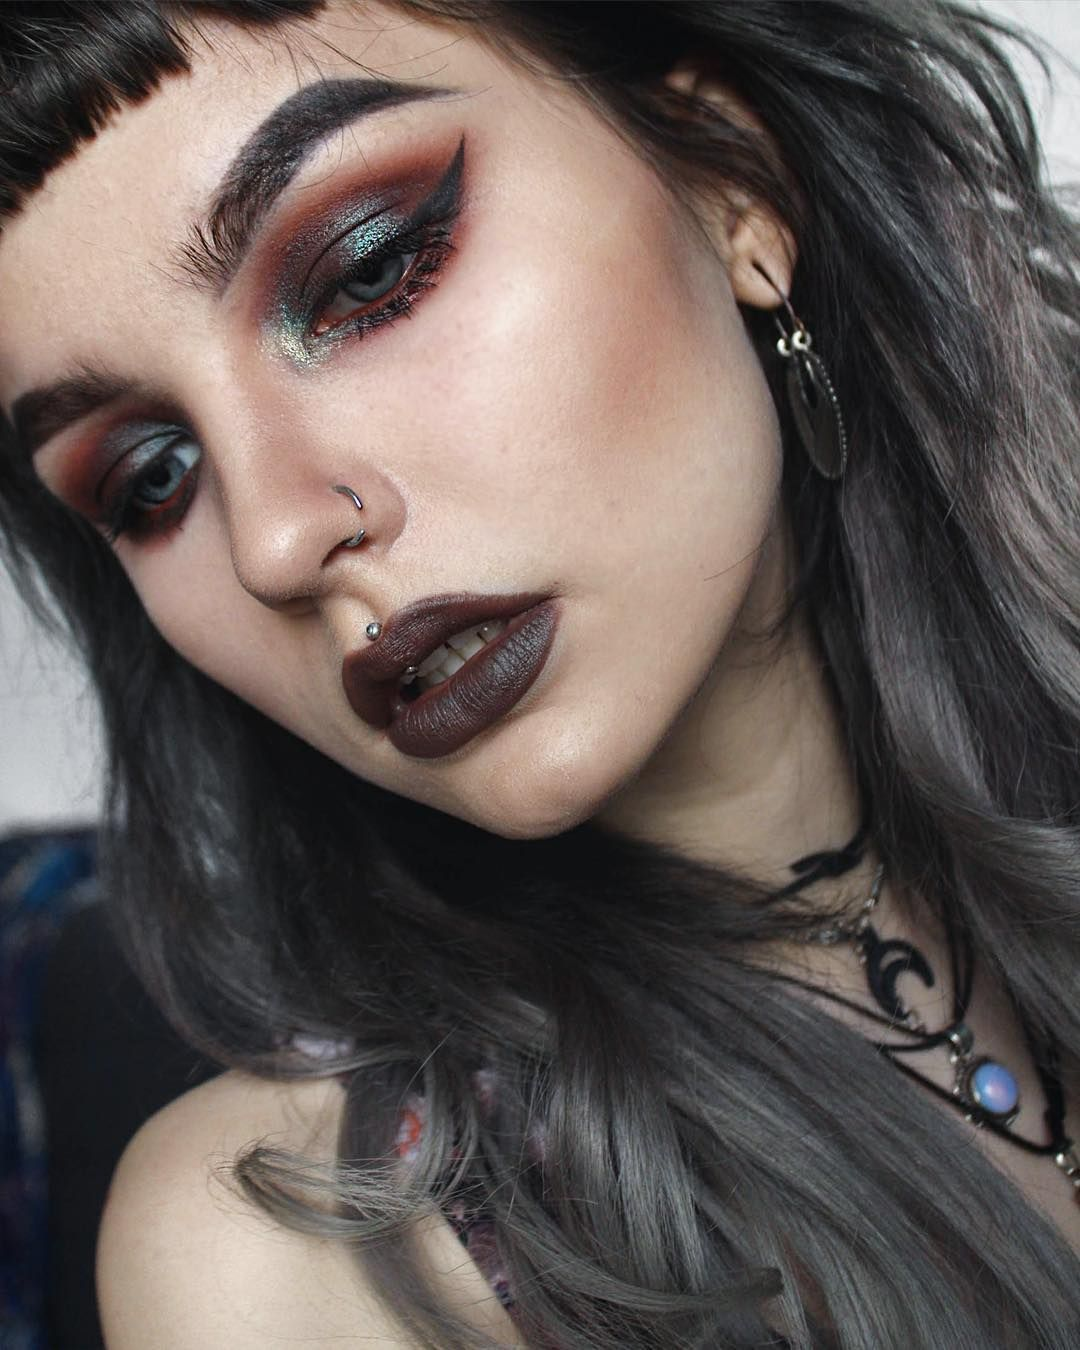 Pin By Cammie Turner On Makeup Pinterest Makeup Makeup Inspo - Grunge-makeup-ideas